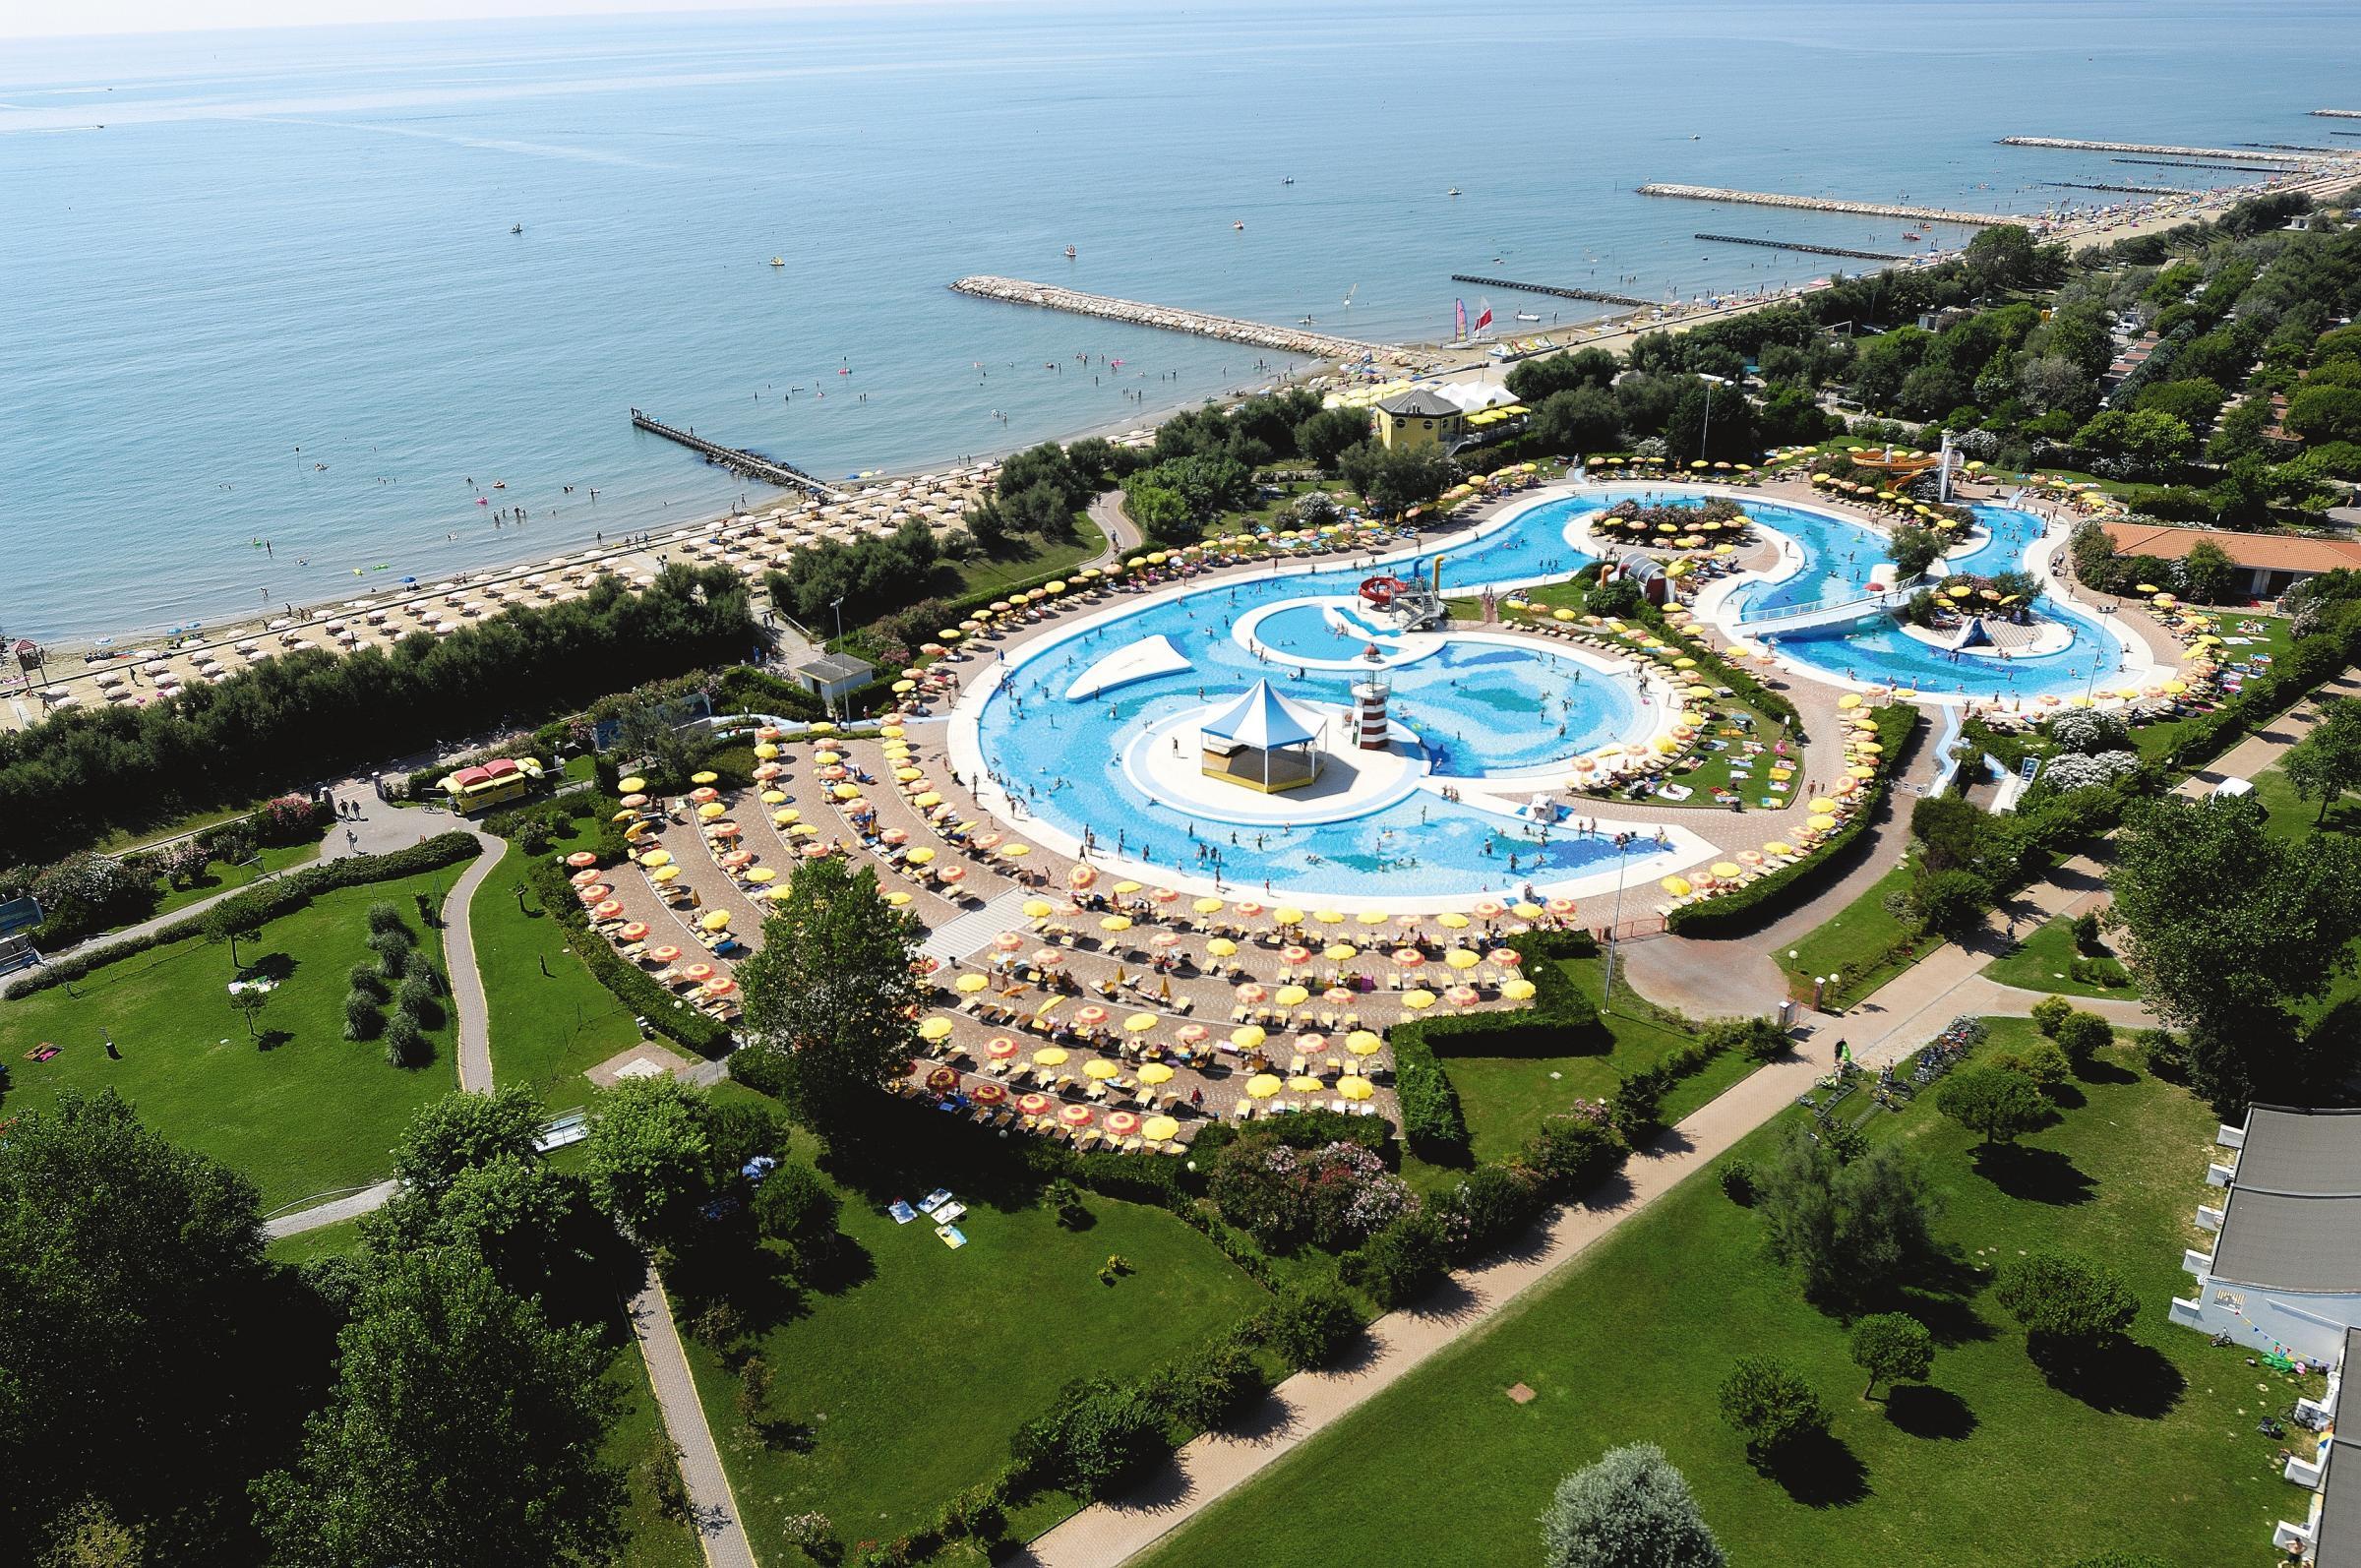 Travel: Sun, sea, fun and Venice too